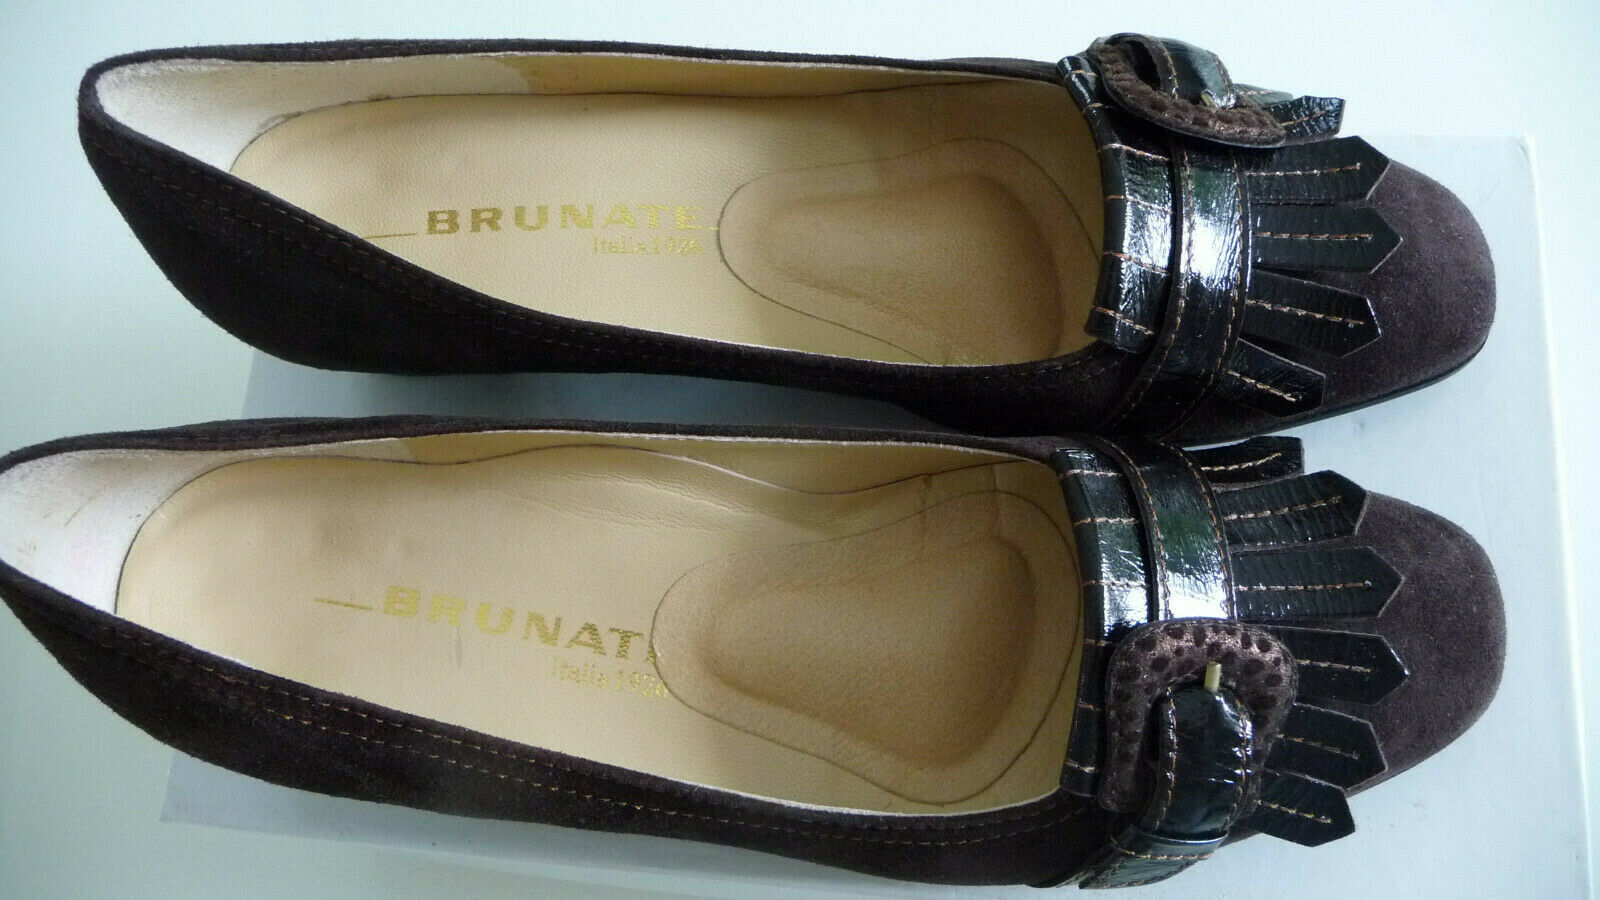 NEU BRUNATE-30329 Damen Schuhe Gr. 38,5 Slipper Halbschuhe Pumps Wildleder braun